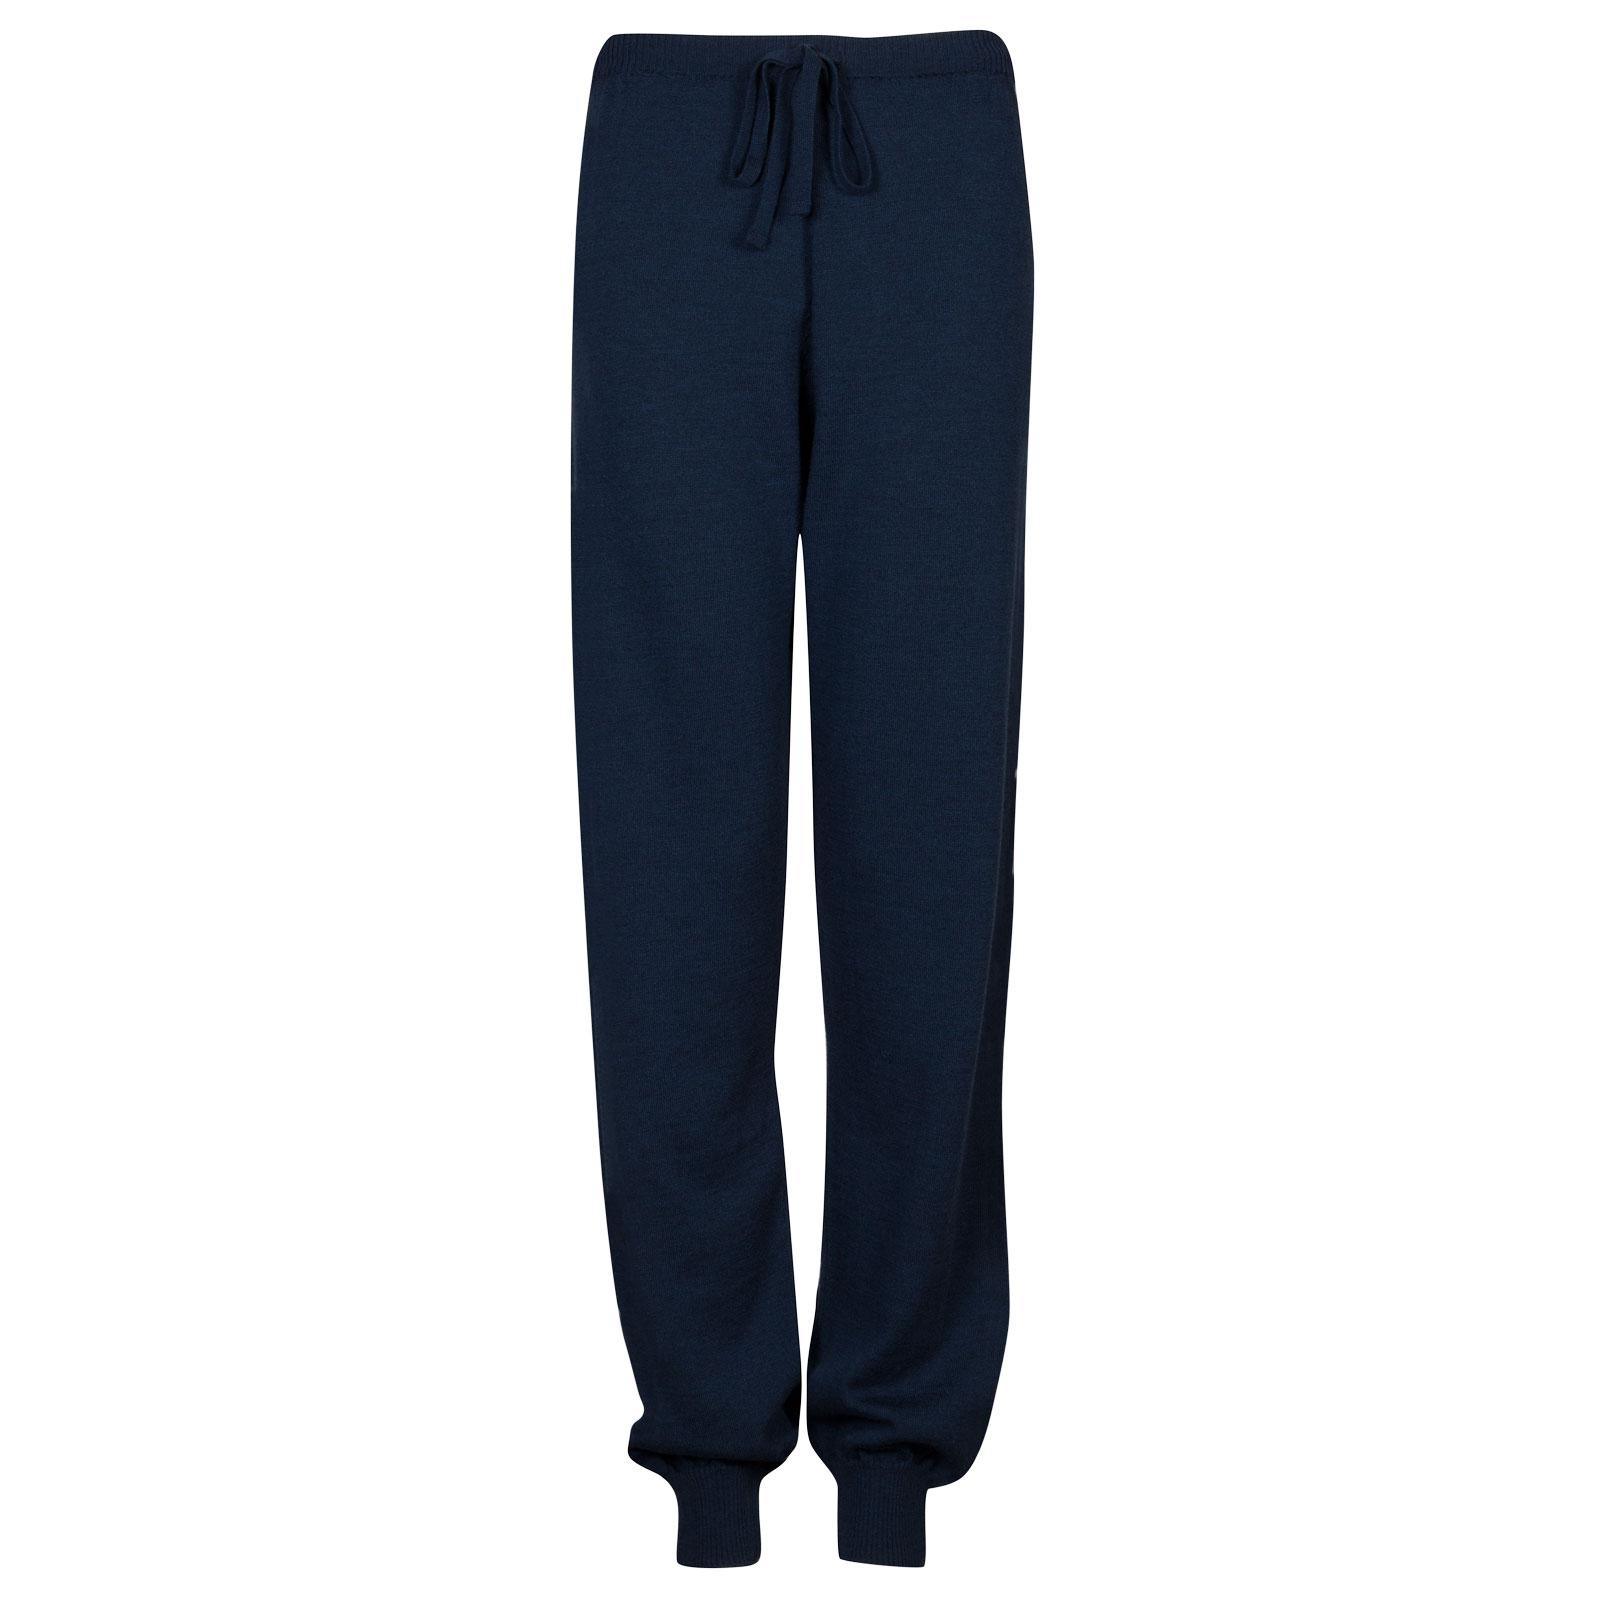 John Smedley Lock Merino Wool Trouser in Indigo-XXL